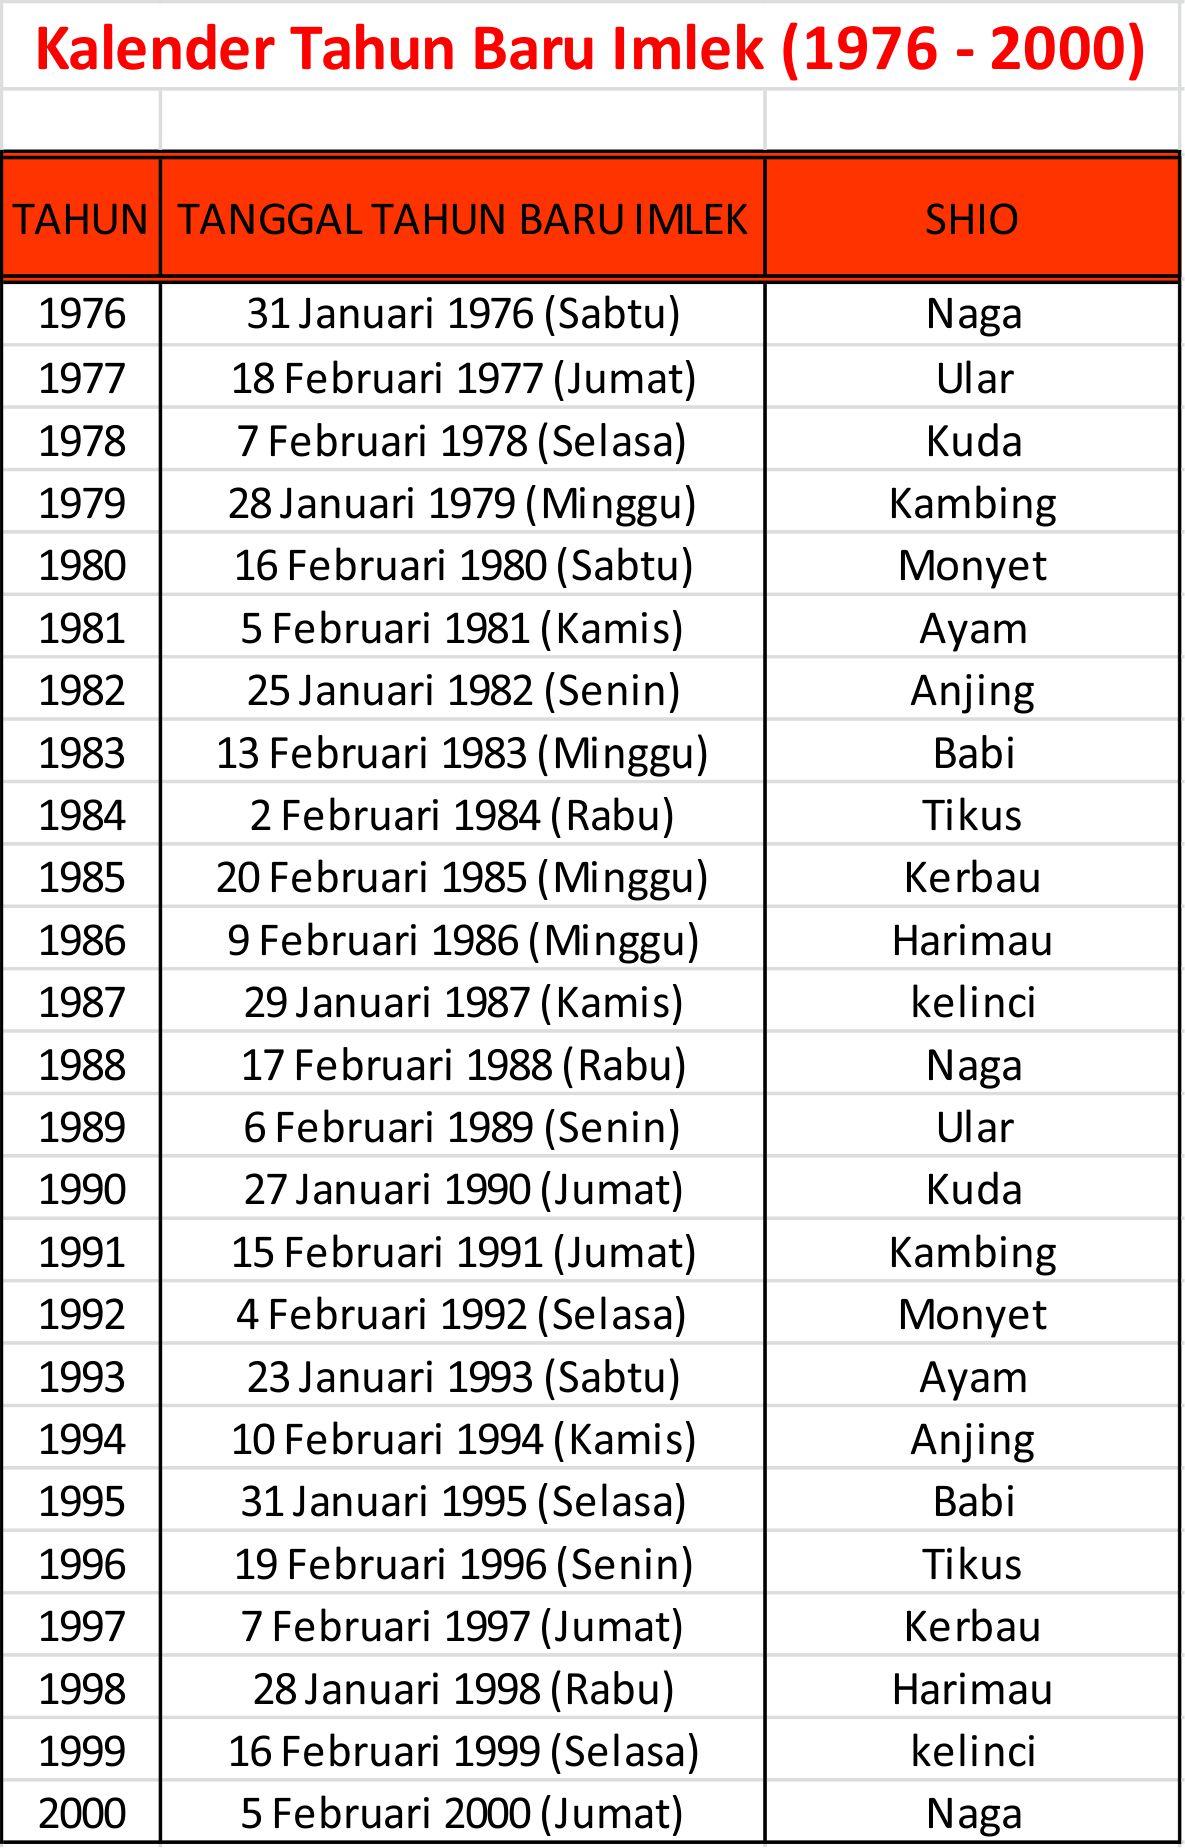 Kalender Tahun Baru Imlek (1976 - 2000)